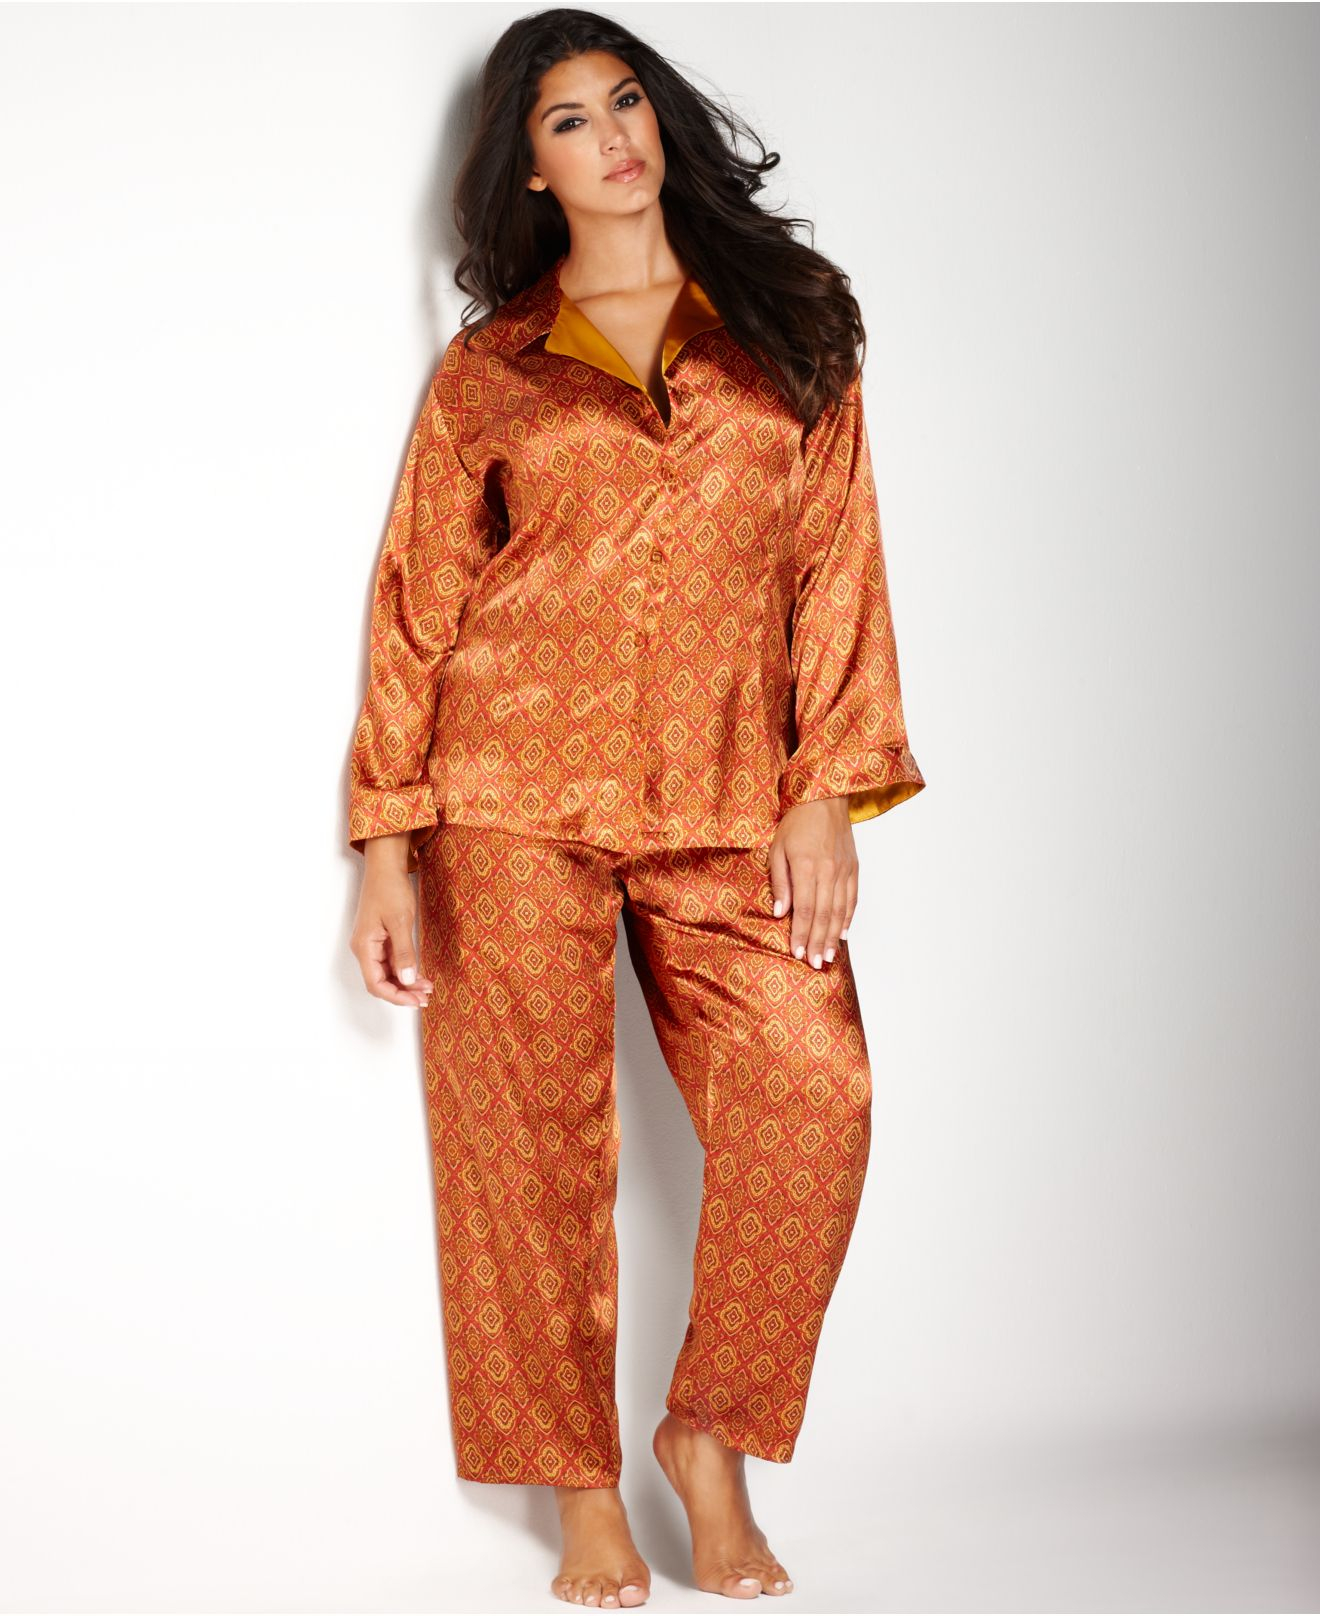 7e186b37bf43c Lyst - Jones New York Plus Size Printed Satin Pajama Set in Orange